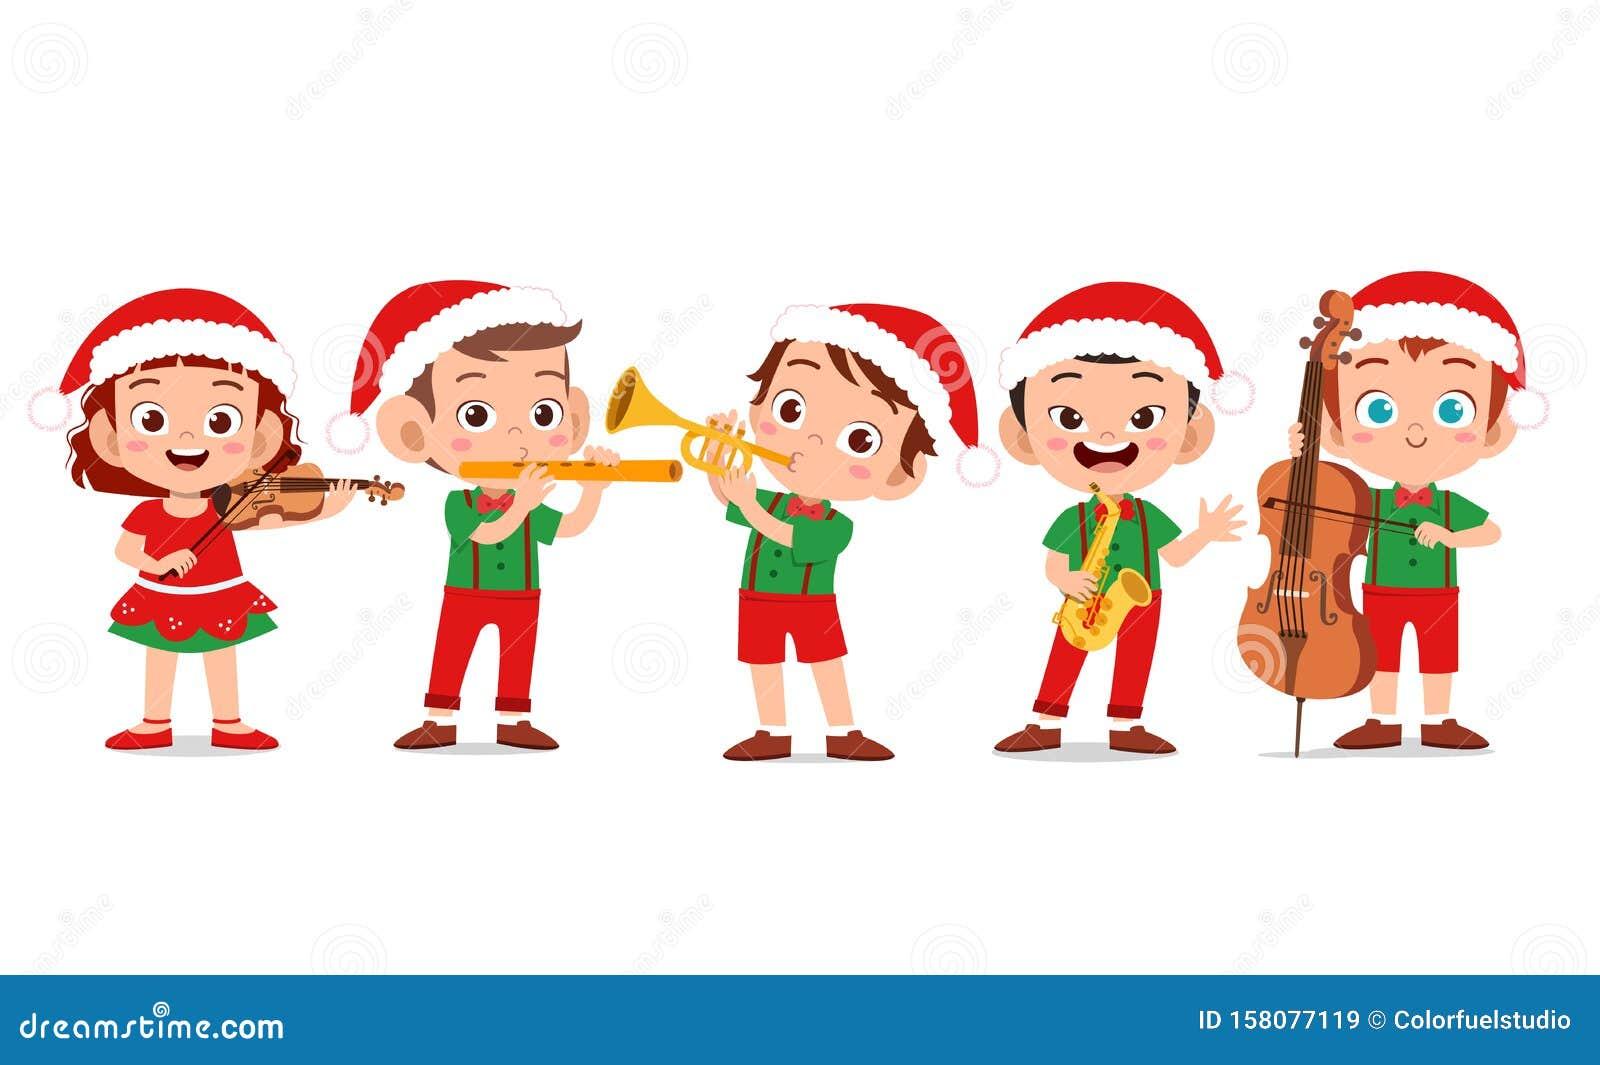 Christmas Music Clip Art - Royalty Free - GoGraph